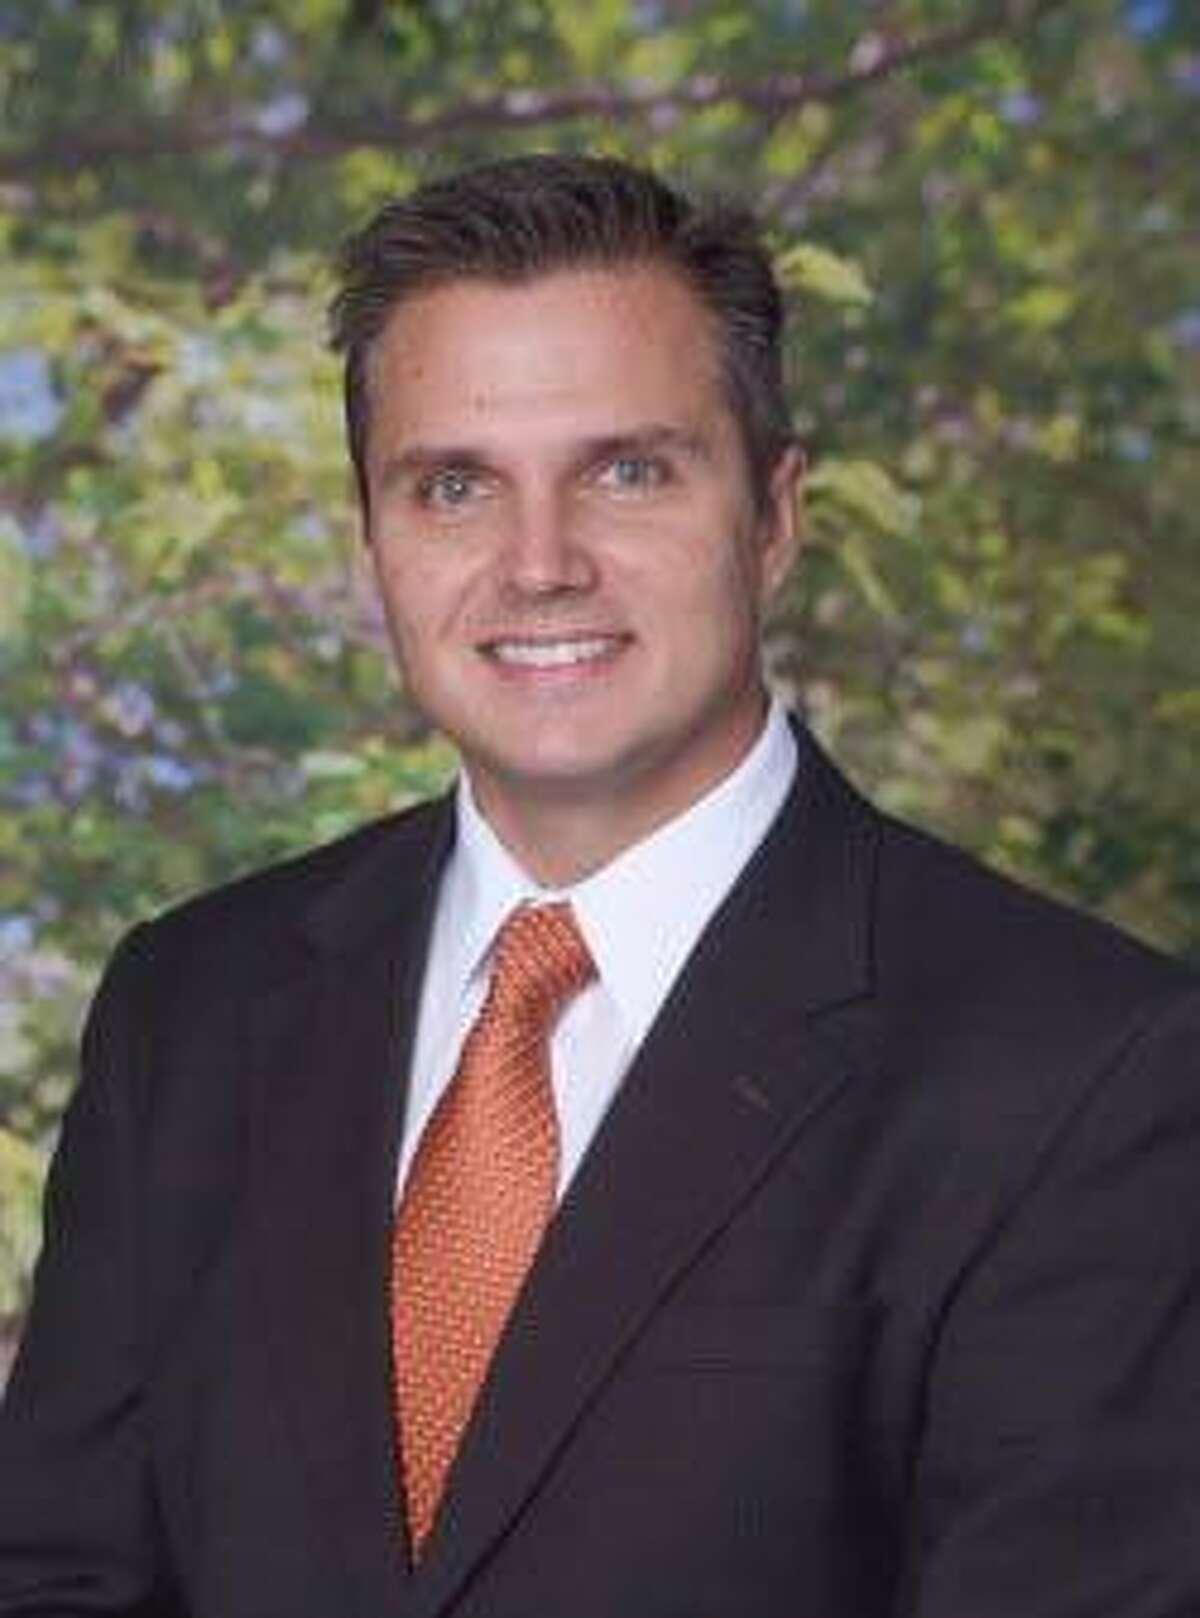 John Barile, the Brookfield Schools superintendent